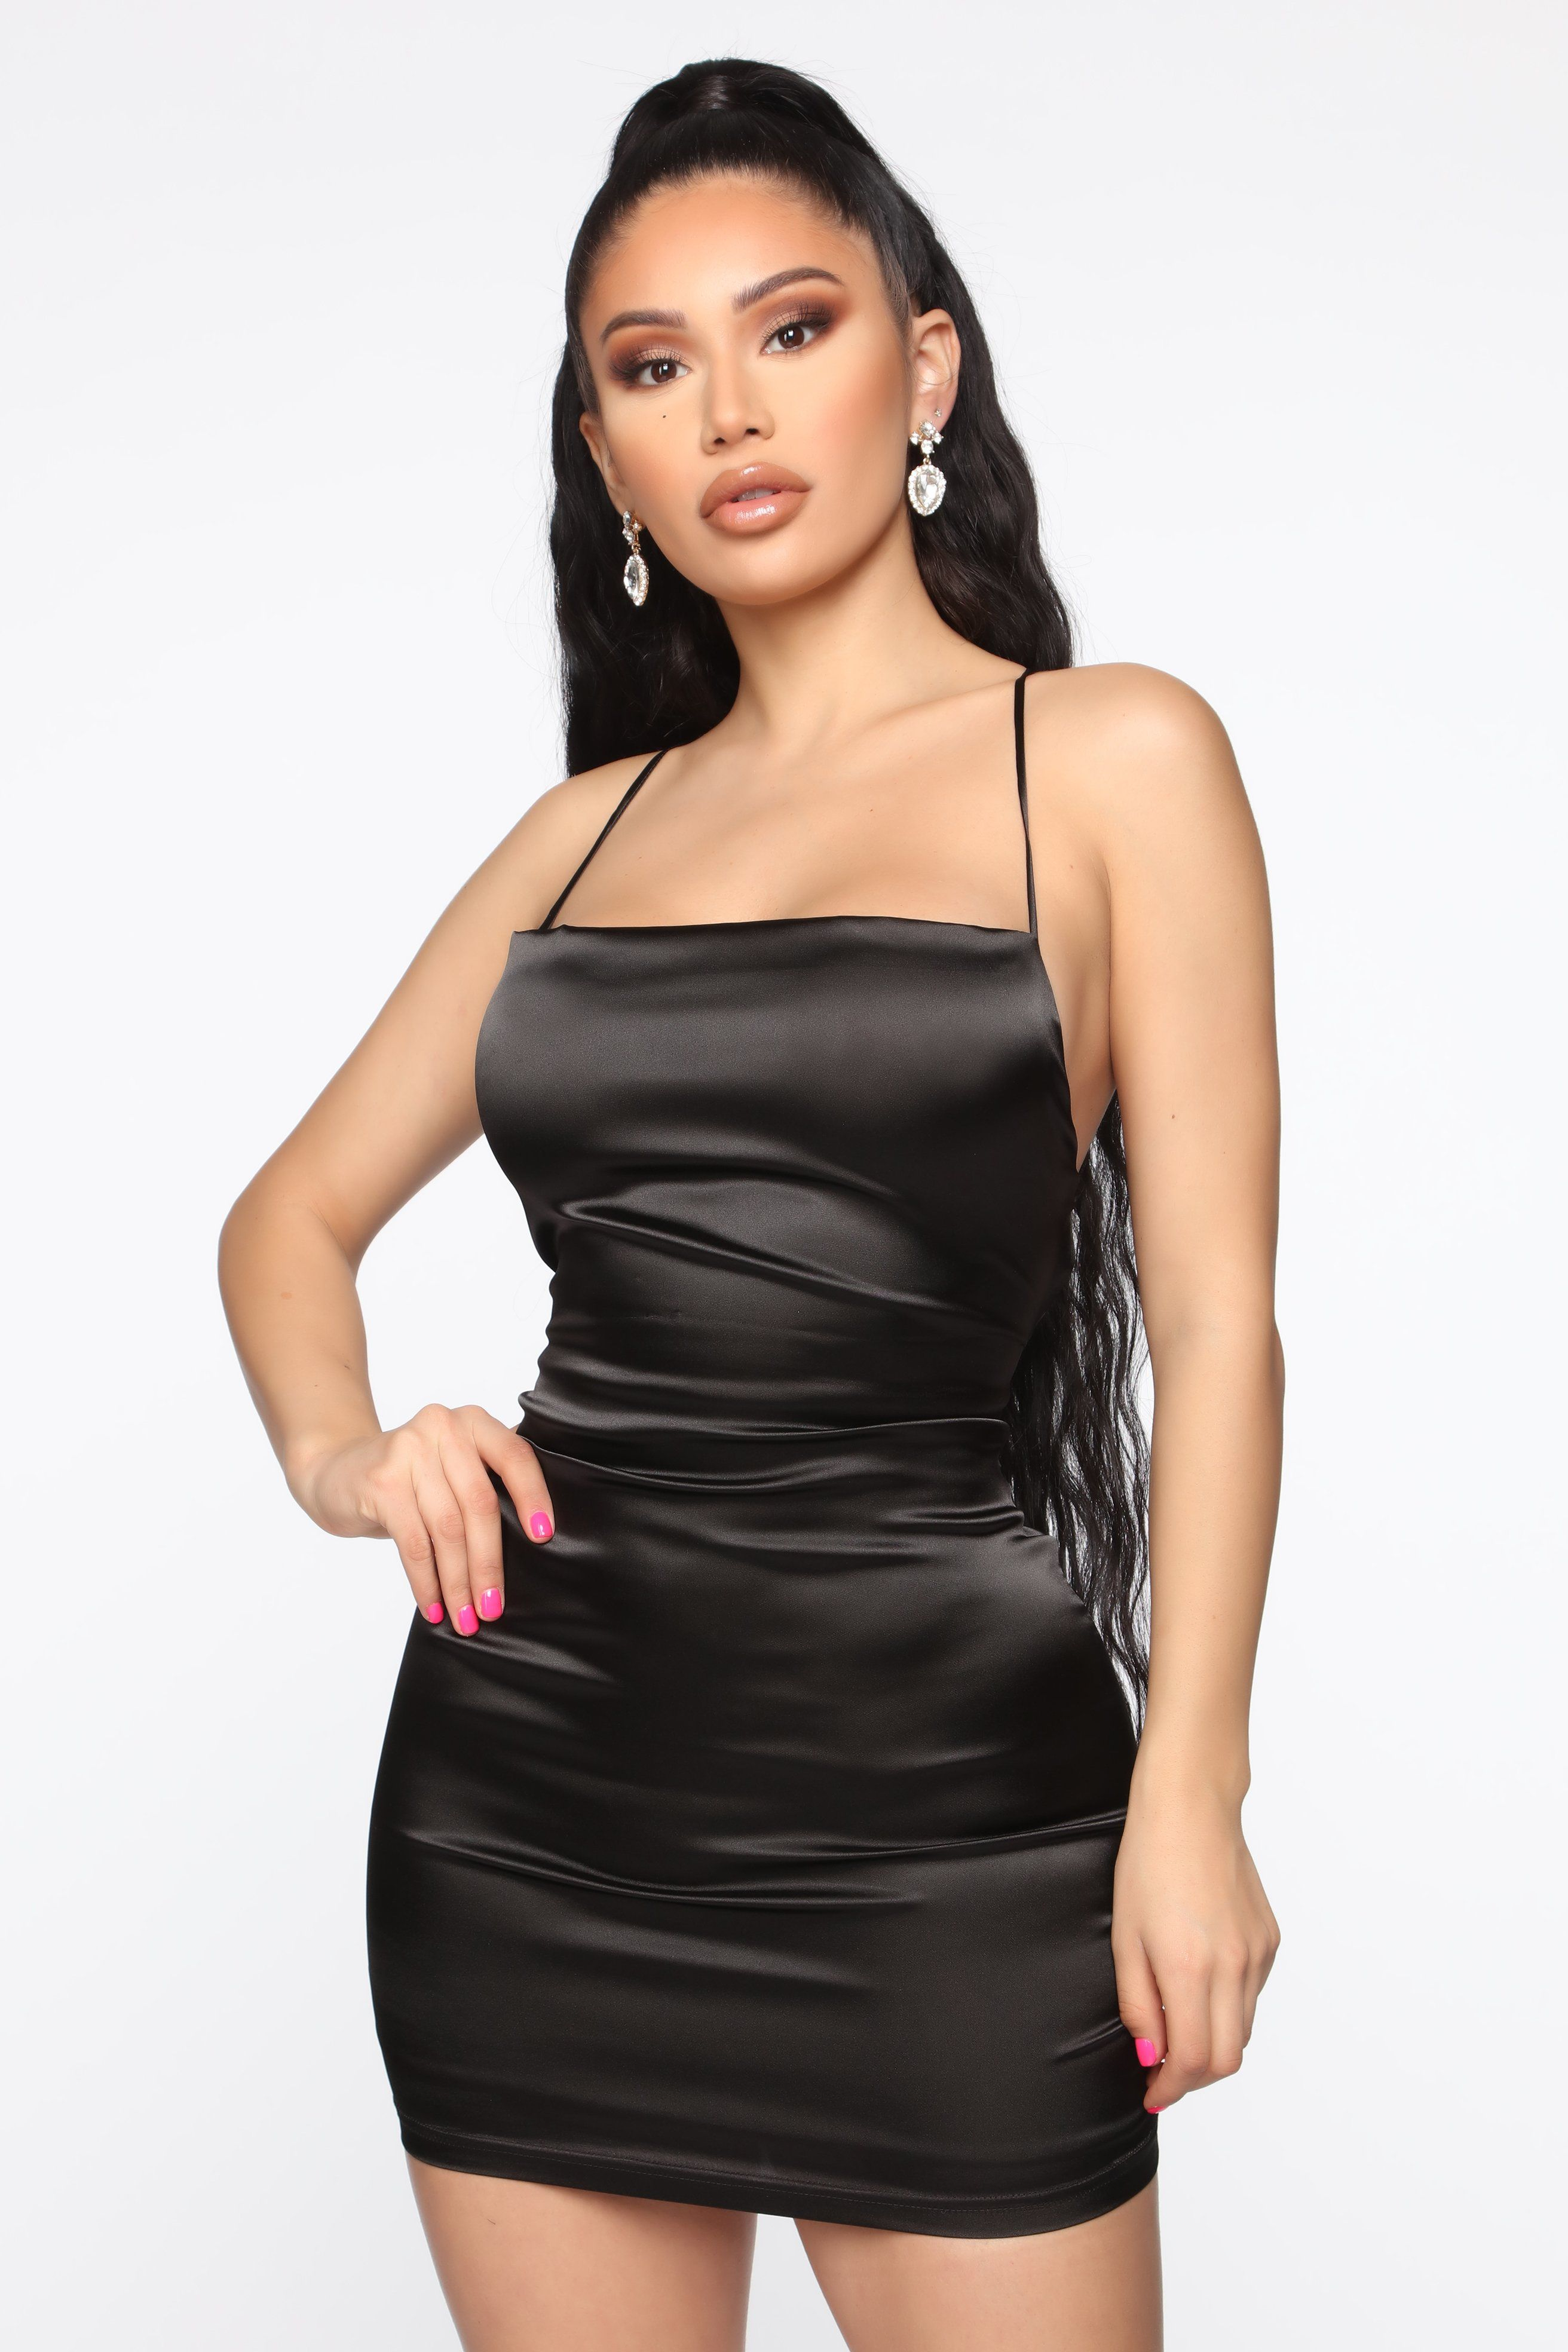 Take Me Higher Satin Mini Dress Black In 2020 Mini Dress Mini Black Dress Black Satin Dress